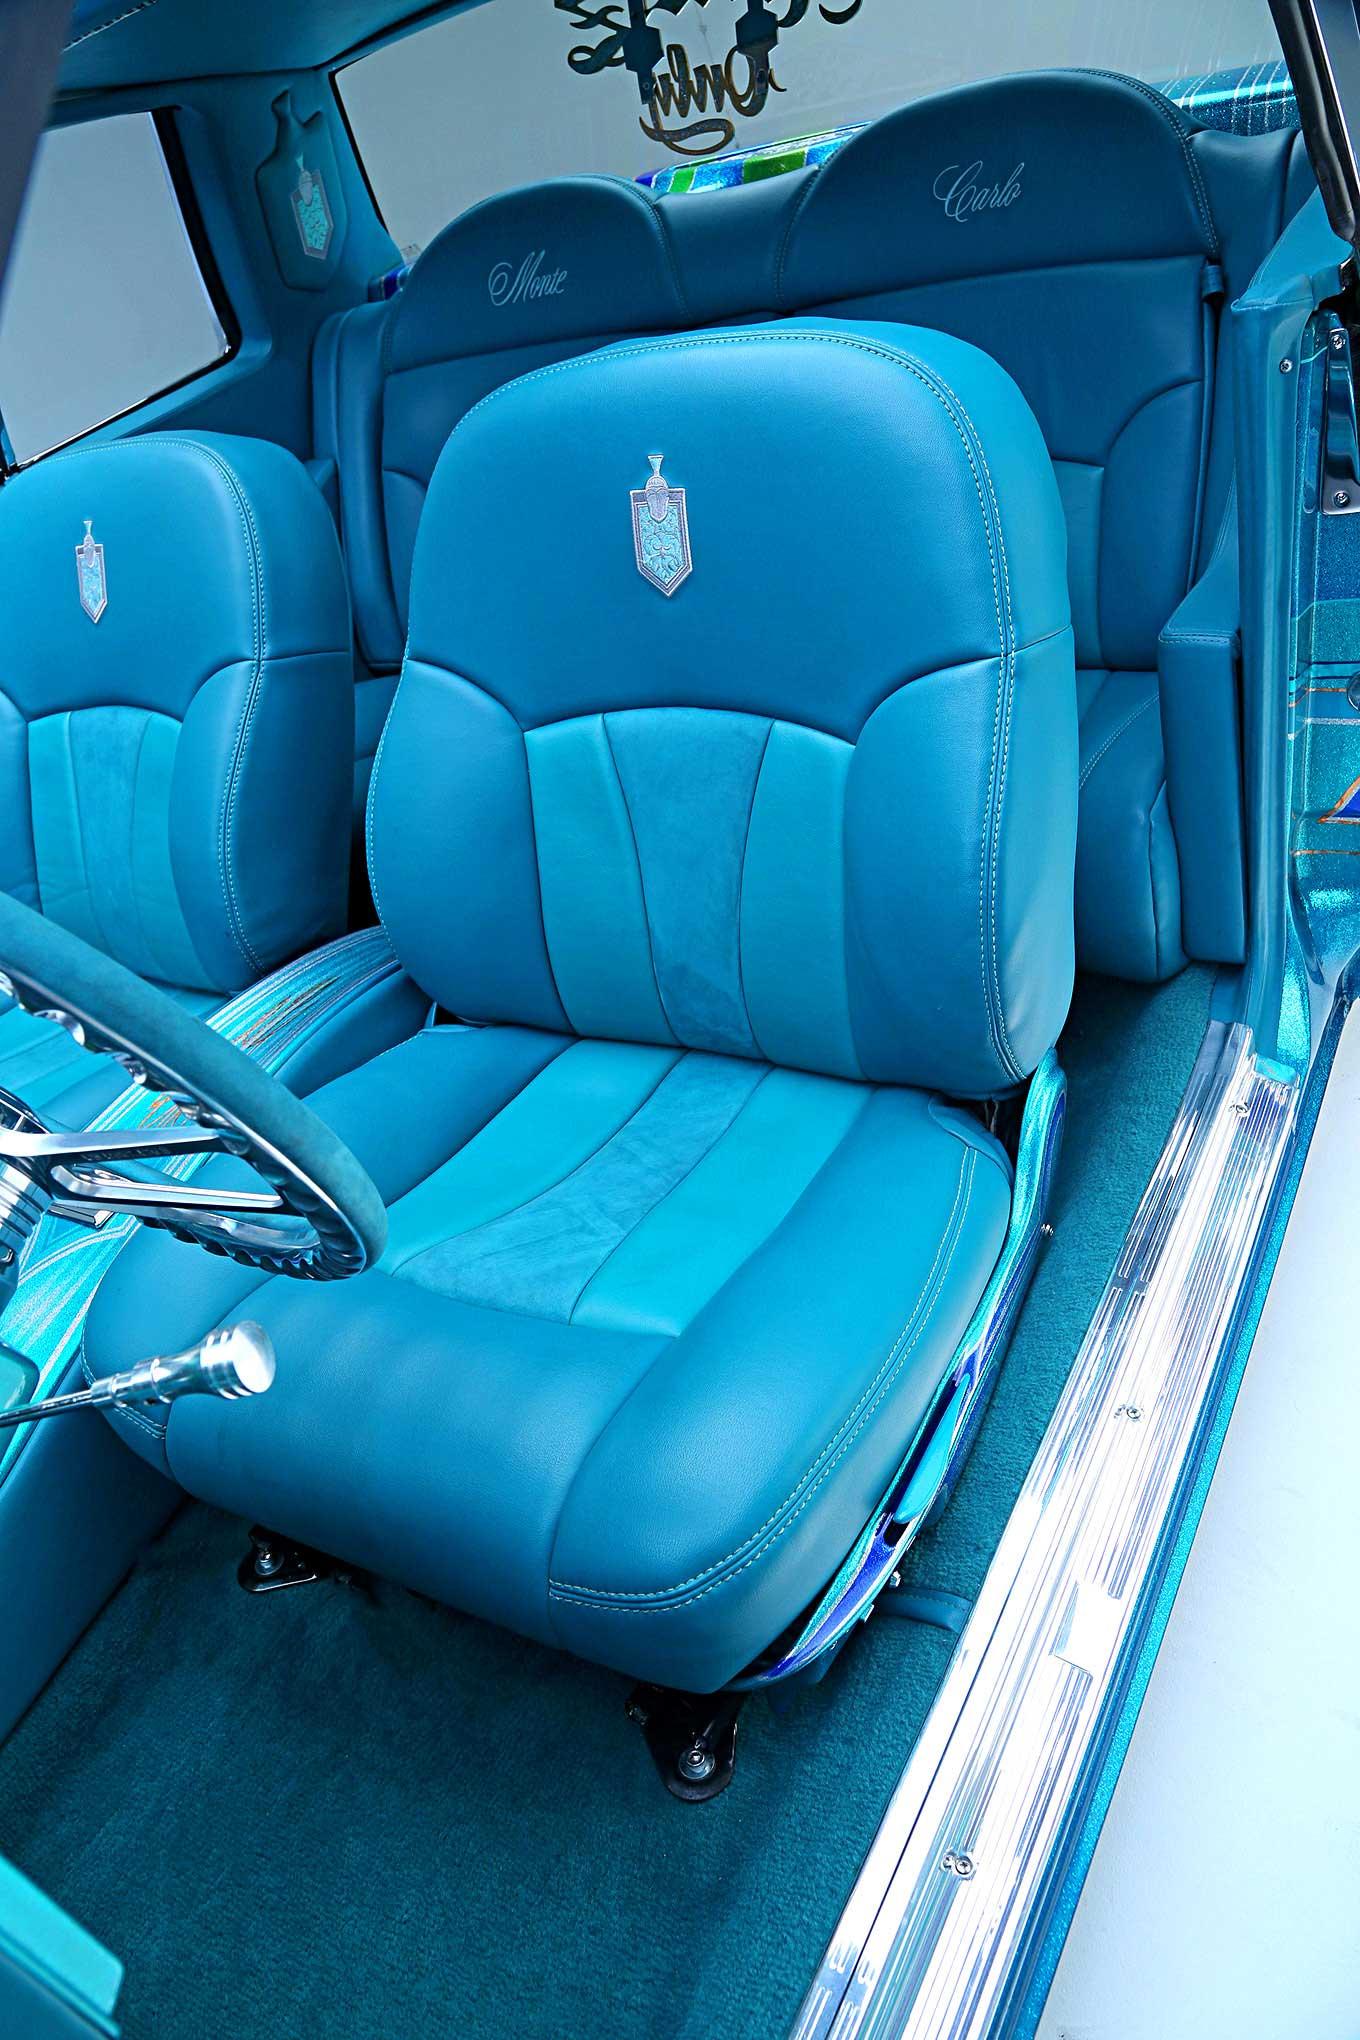 Pleasing 1979 Chevrolet Monte Carlo Bucket Driver Seat Lowrider Inzonedesignstudio Interior Chair Design Inzonedesignstudiocom